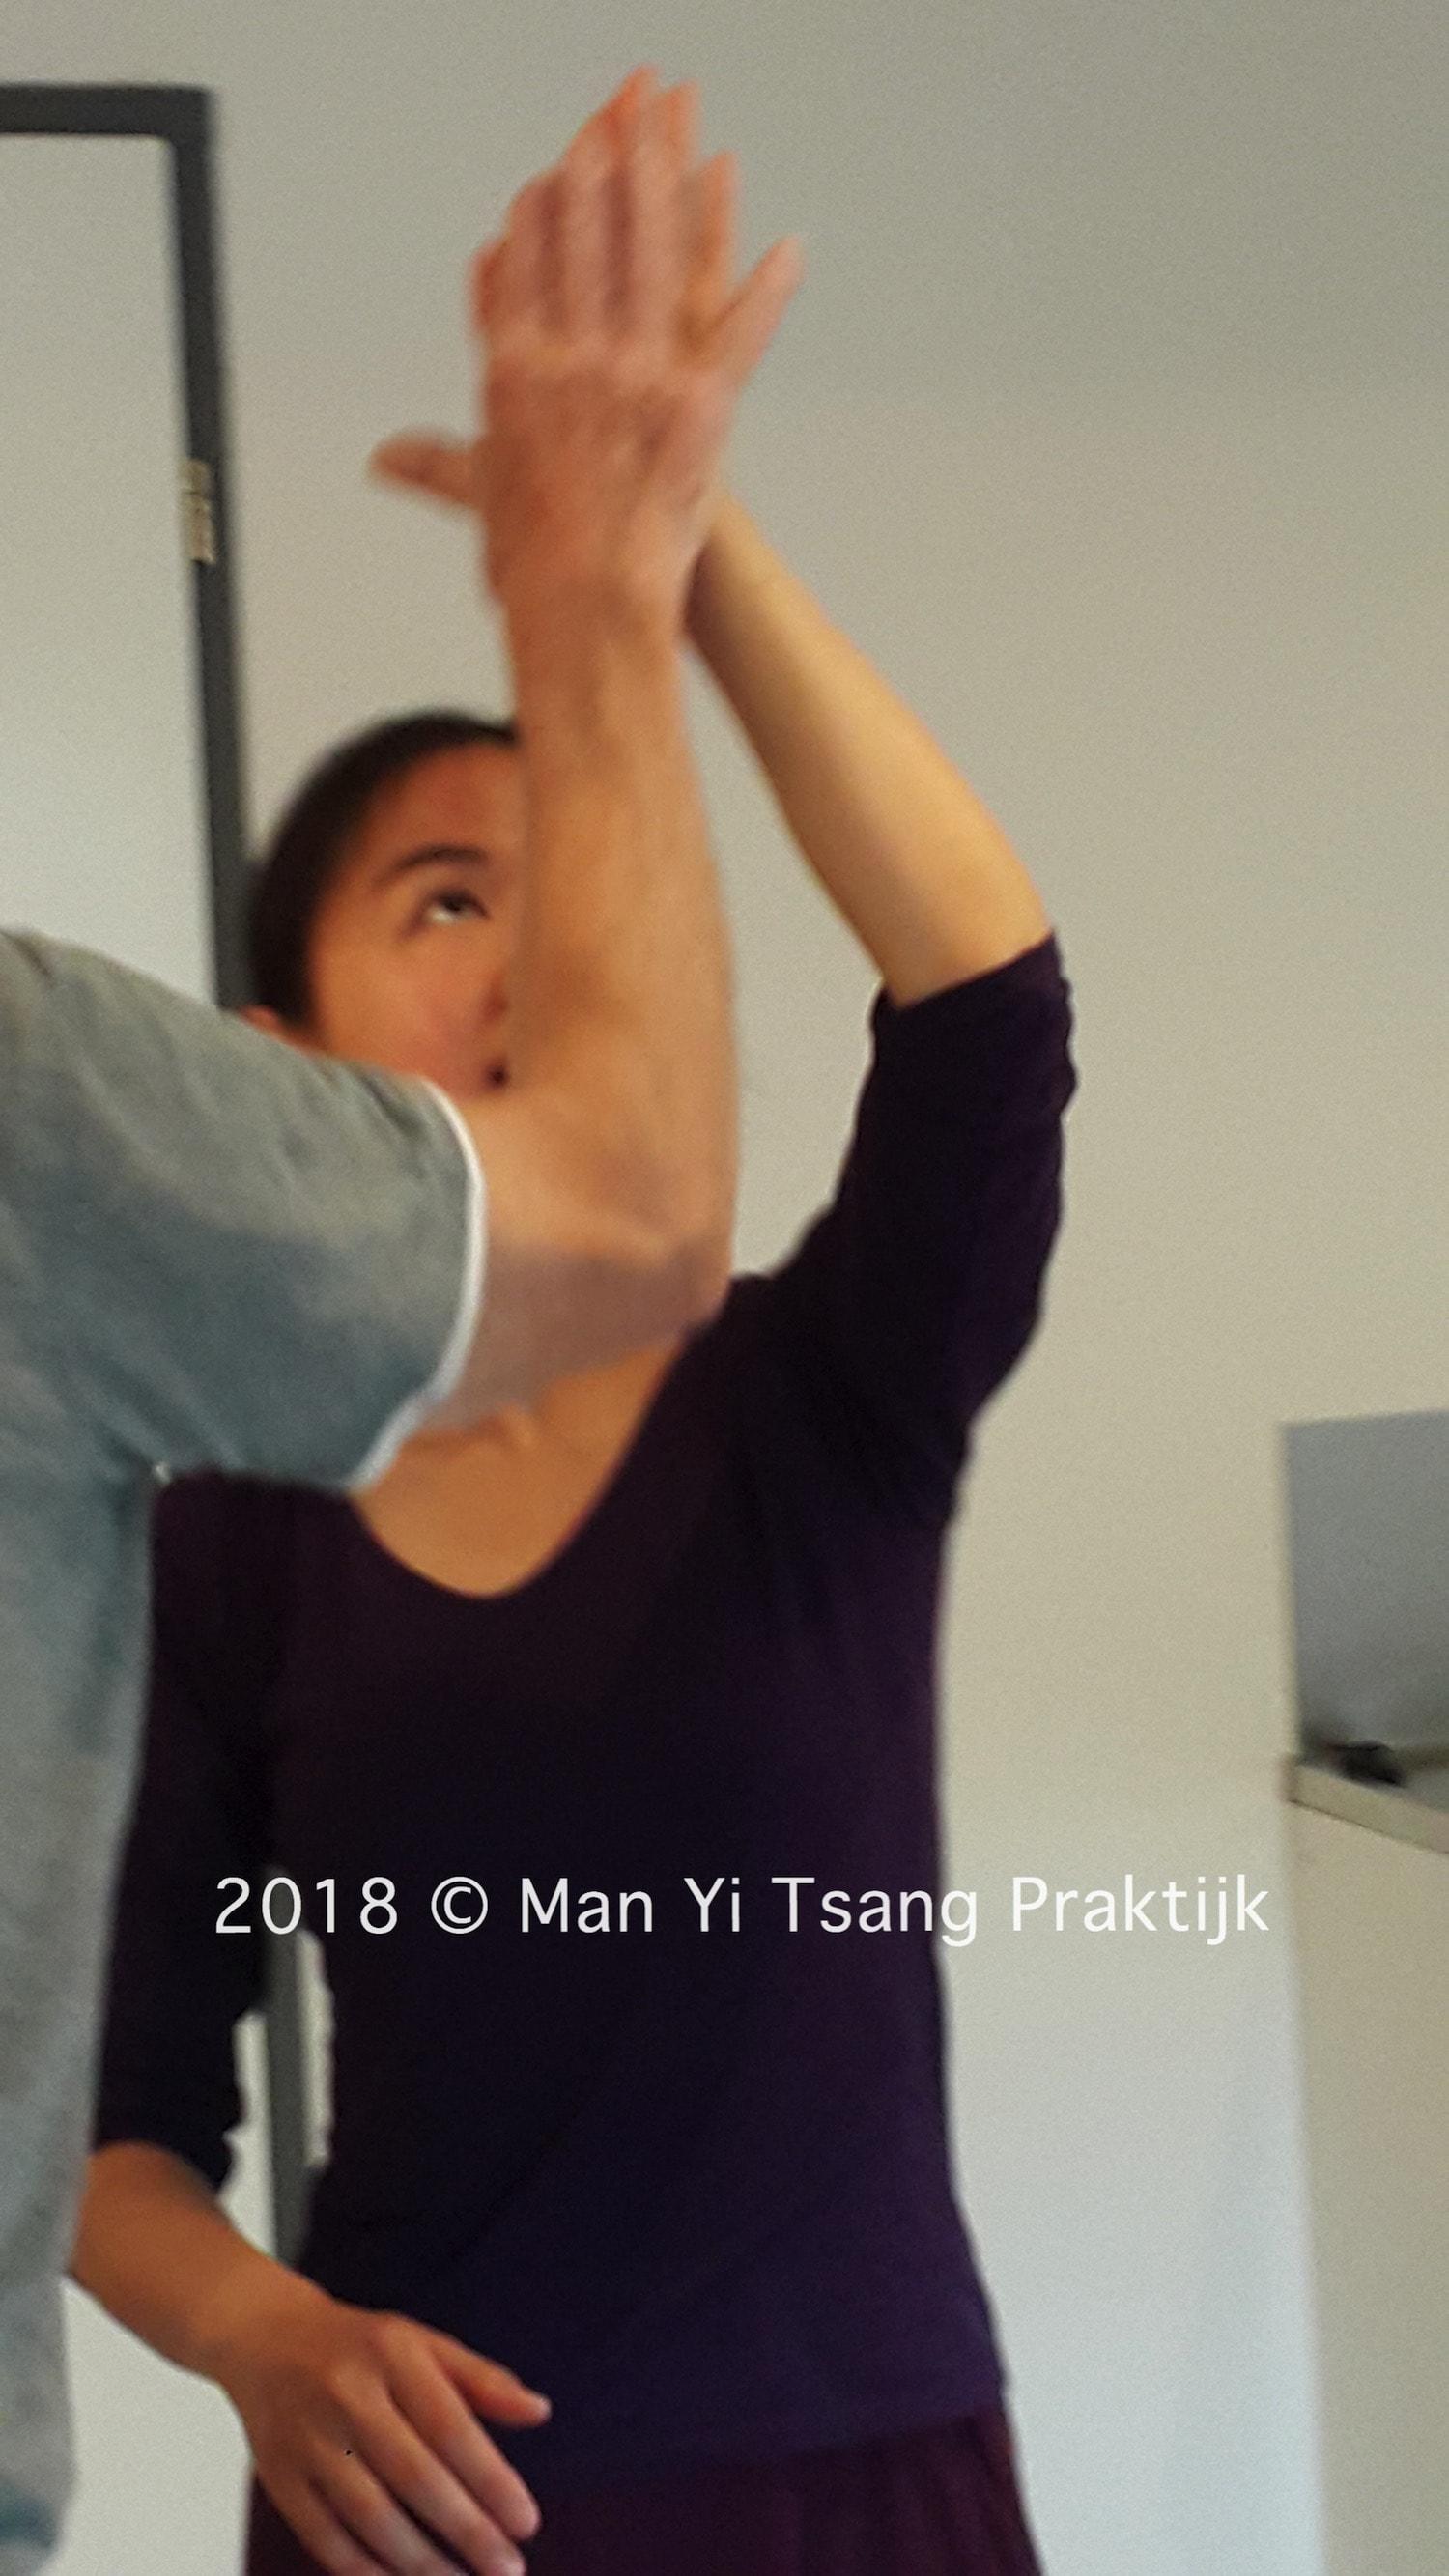 Danstherapie Hand Contact-min.jpg